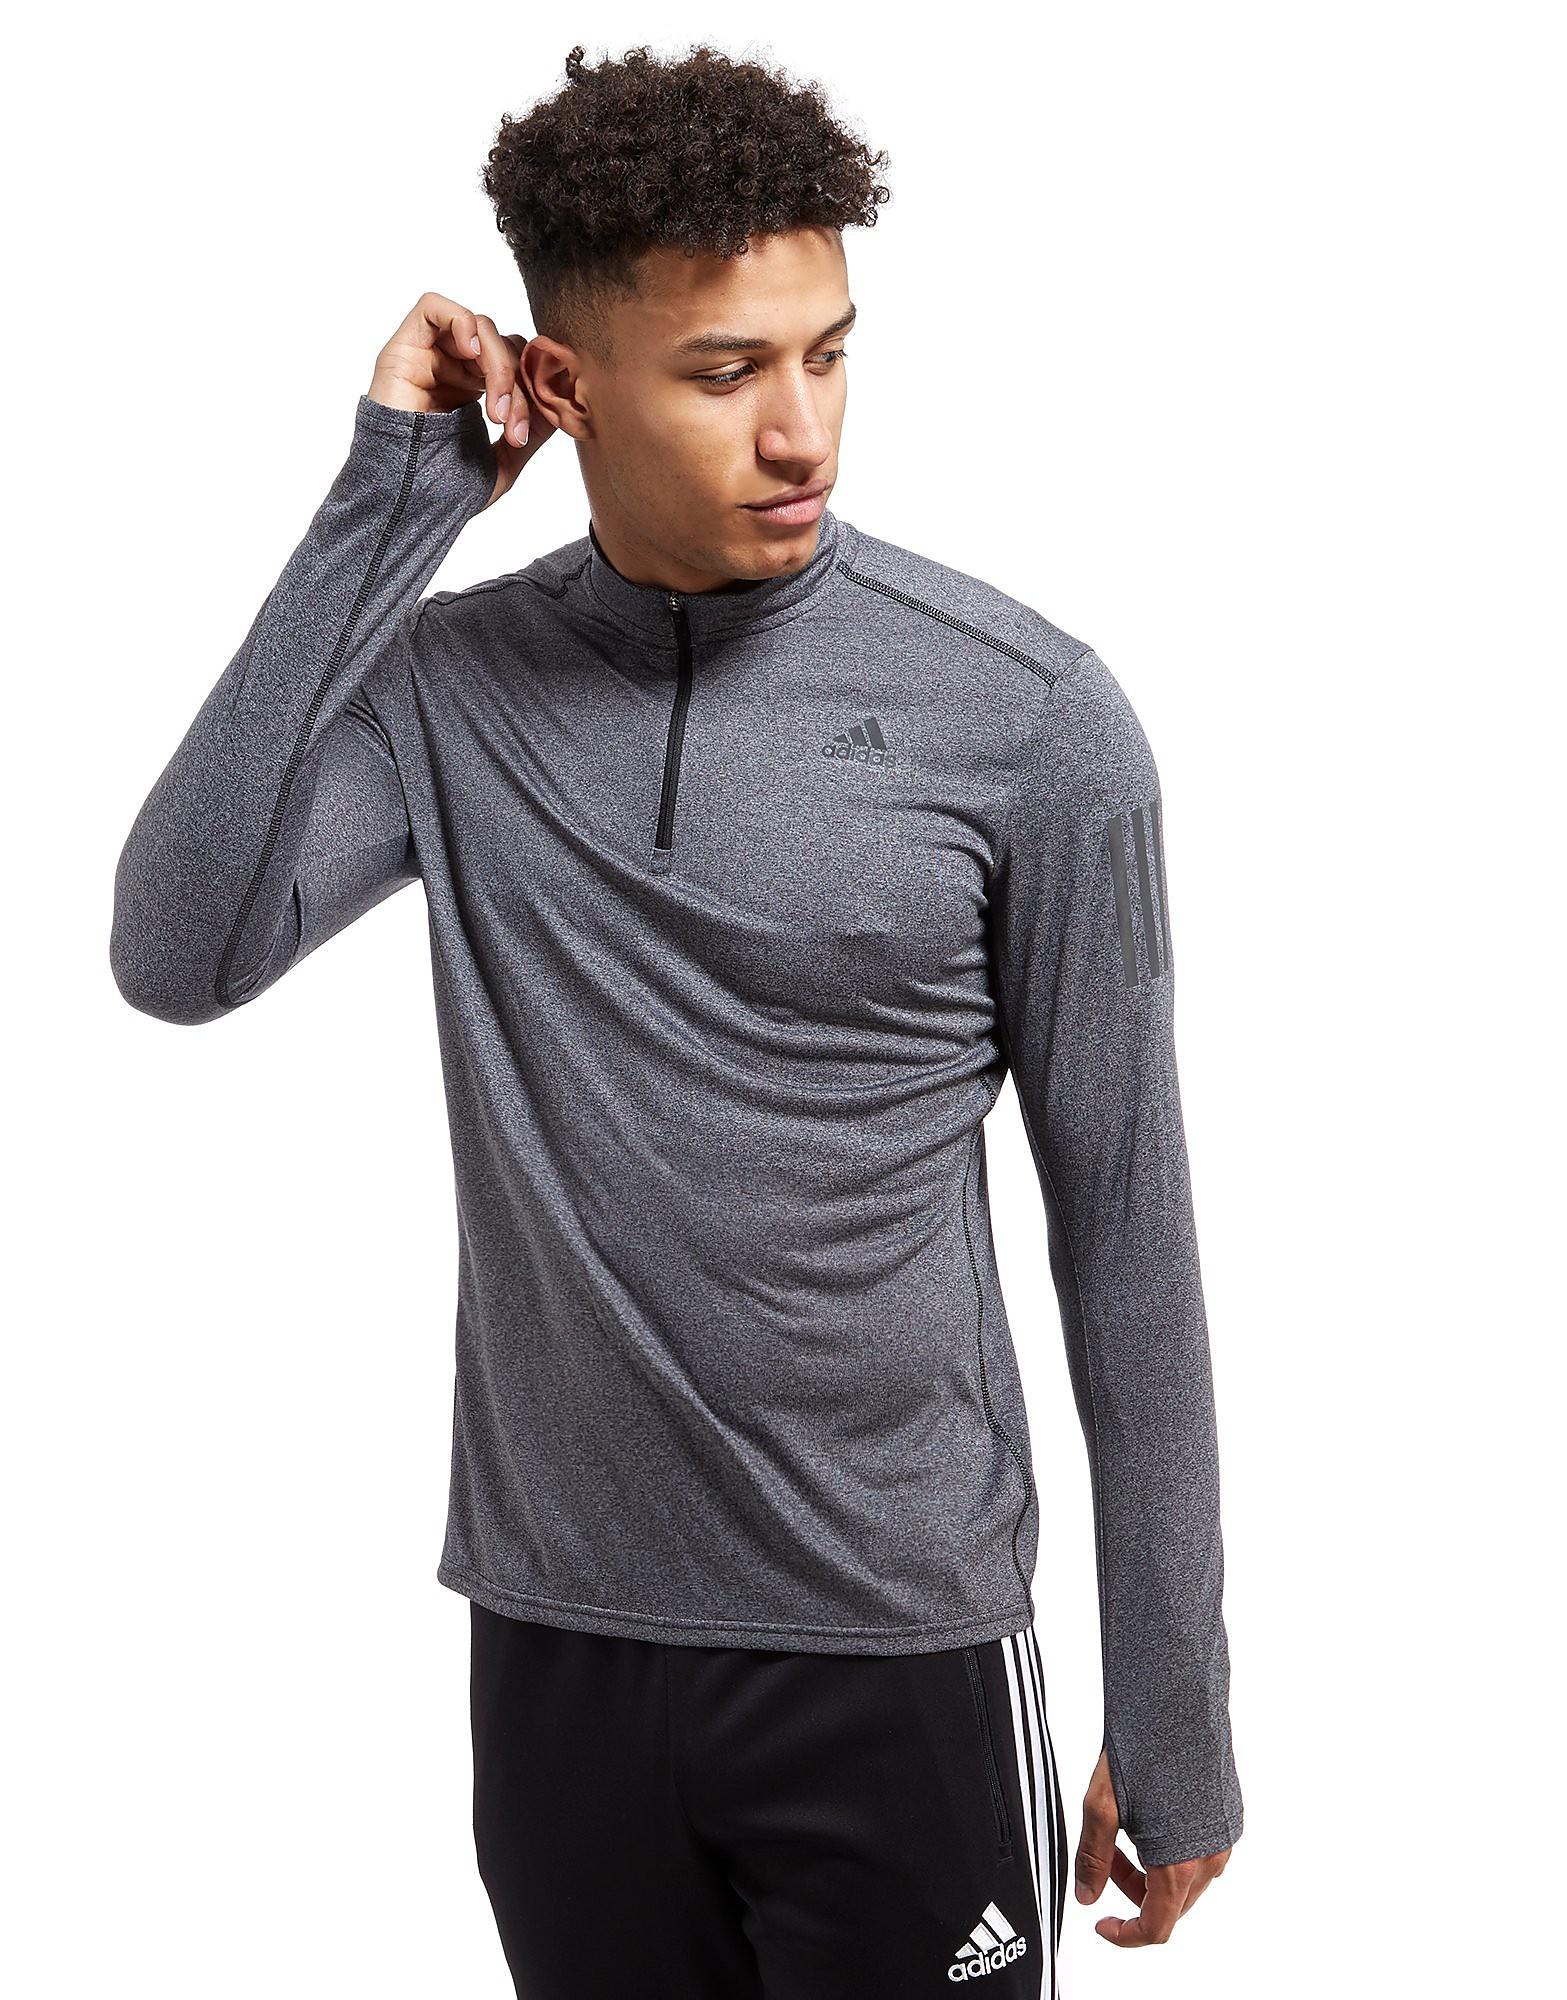 adidas Response Sweatshirt